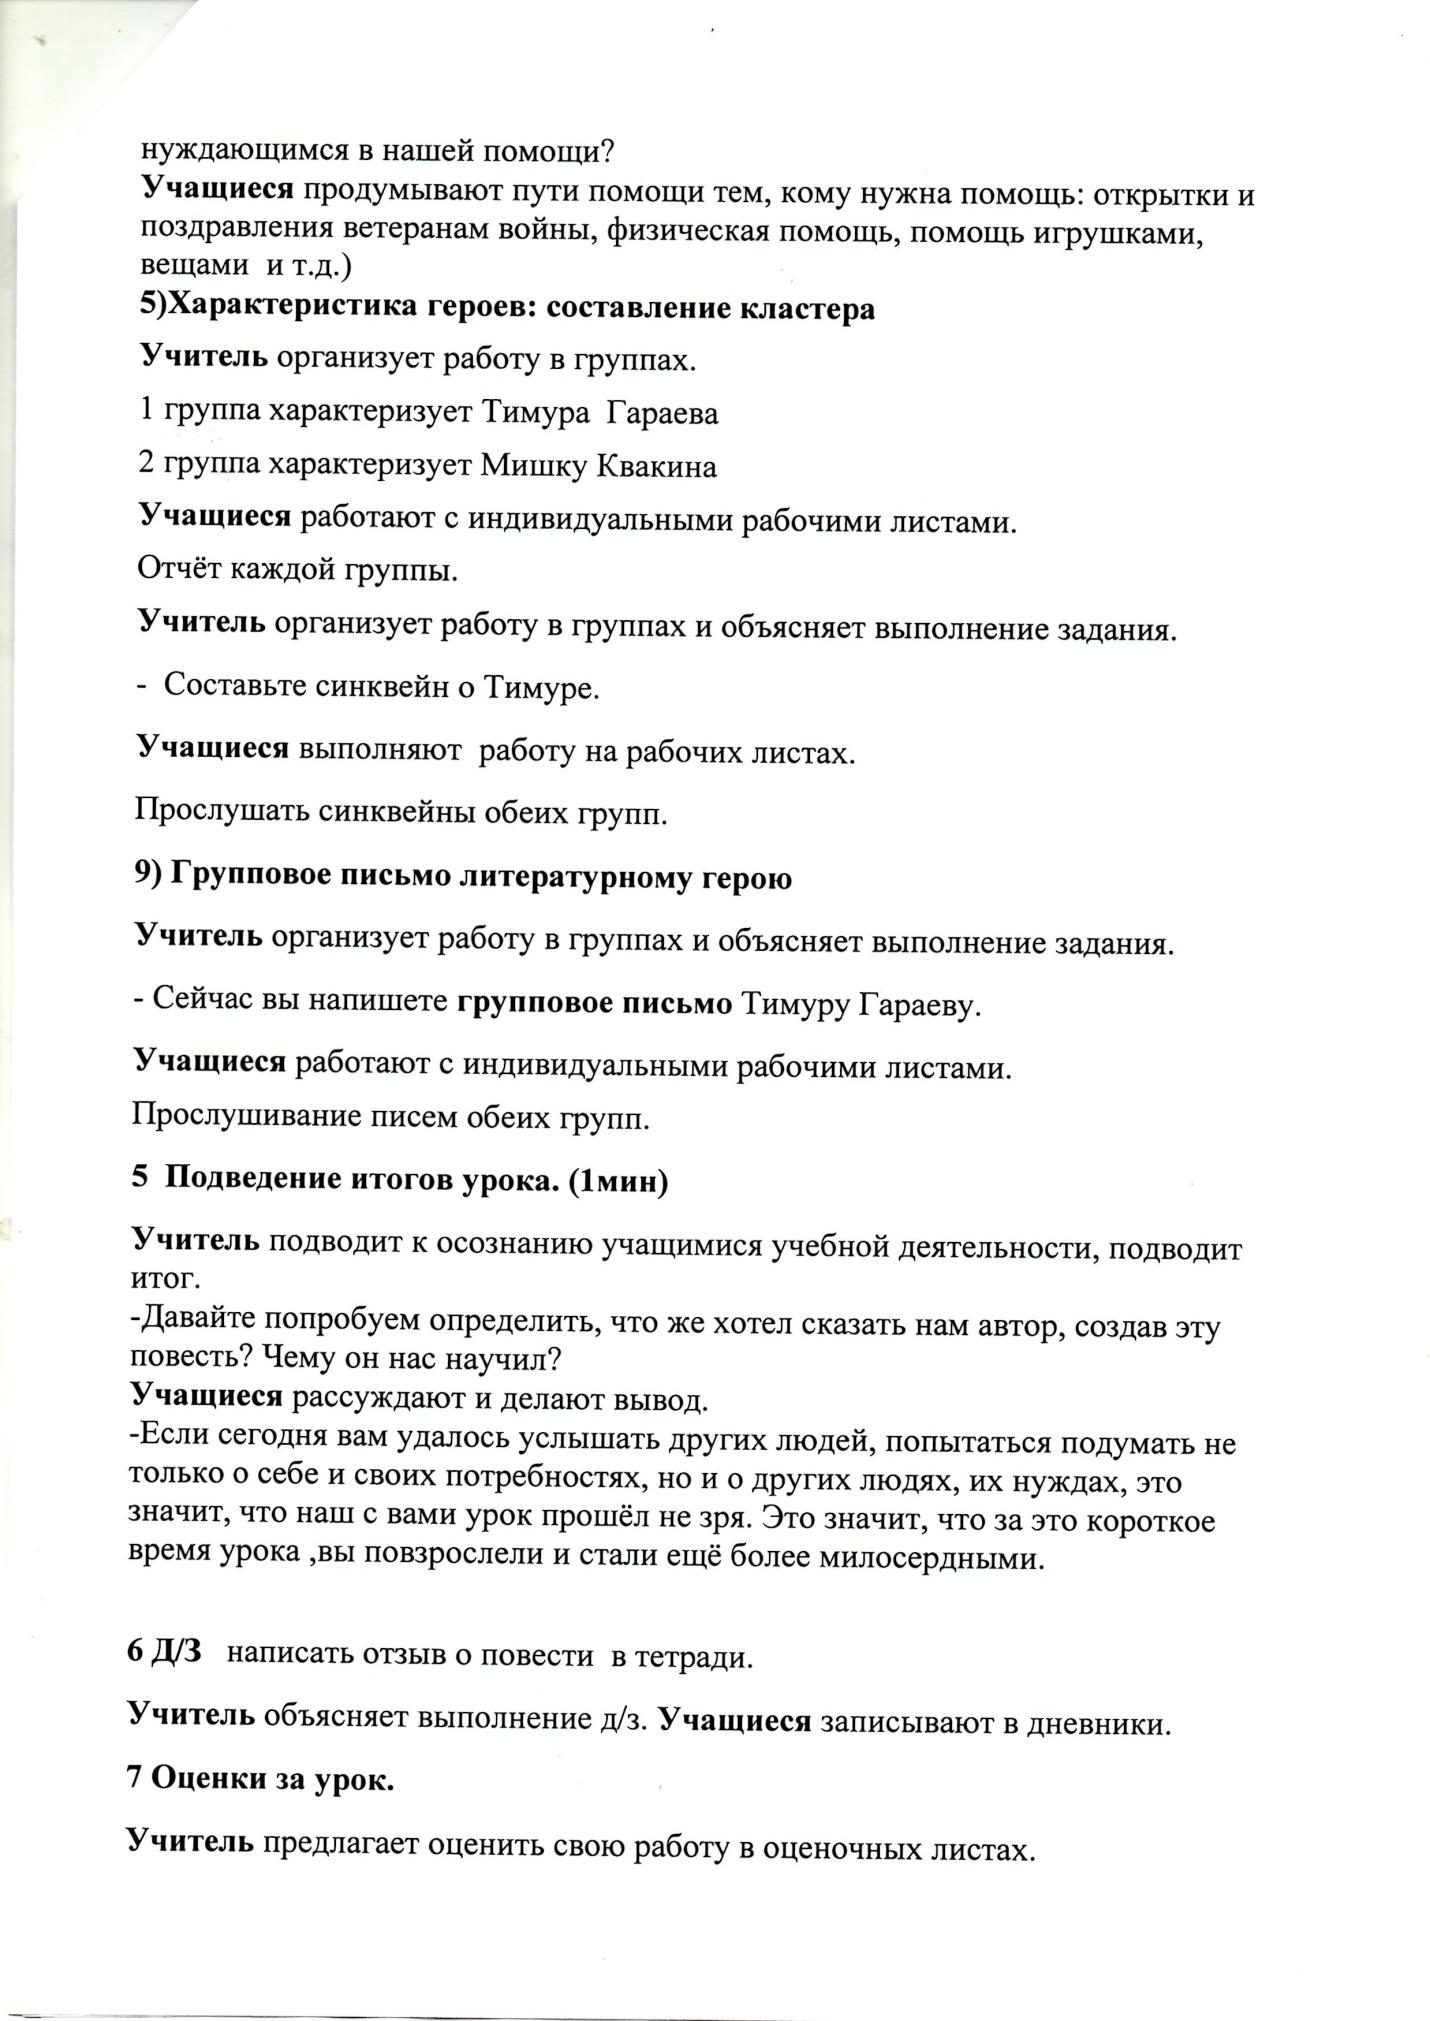 C:\Users\вова\Desktop\сертификаты\img023 (4).jpg